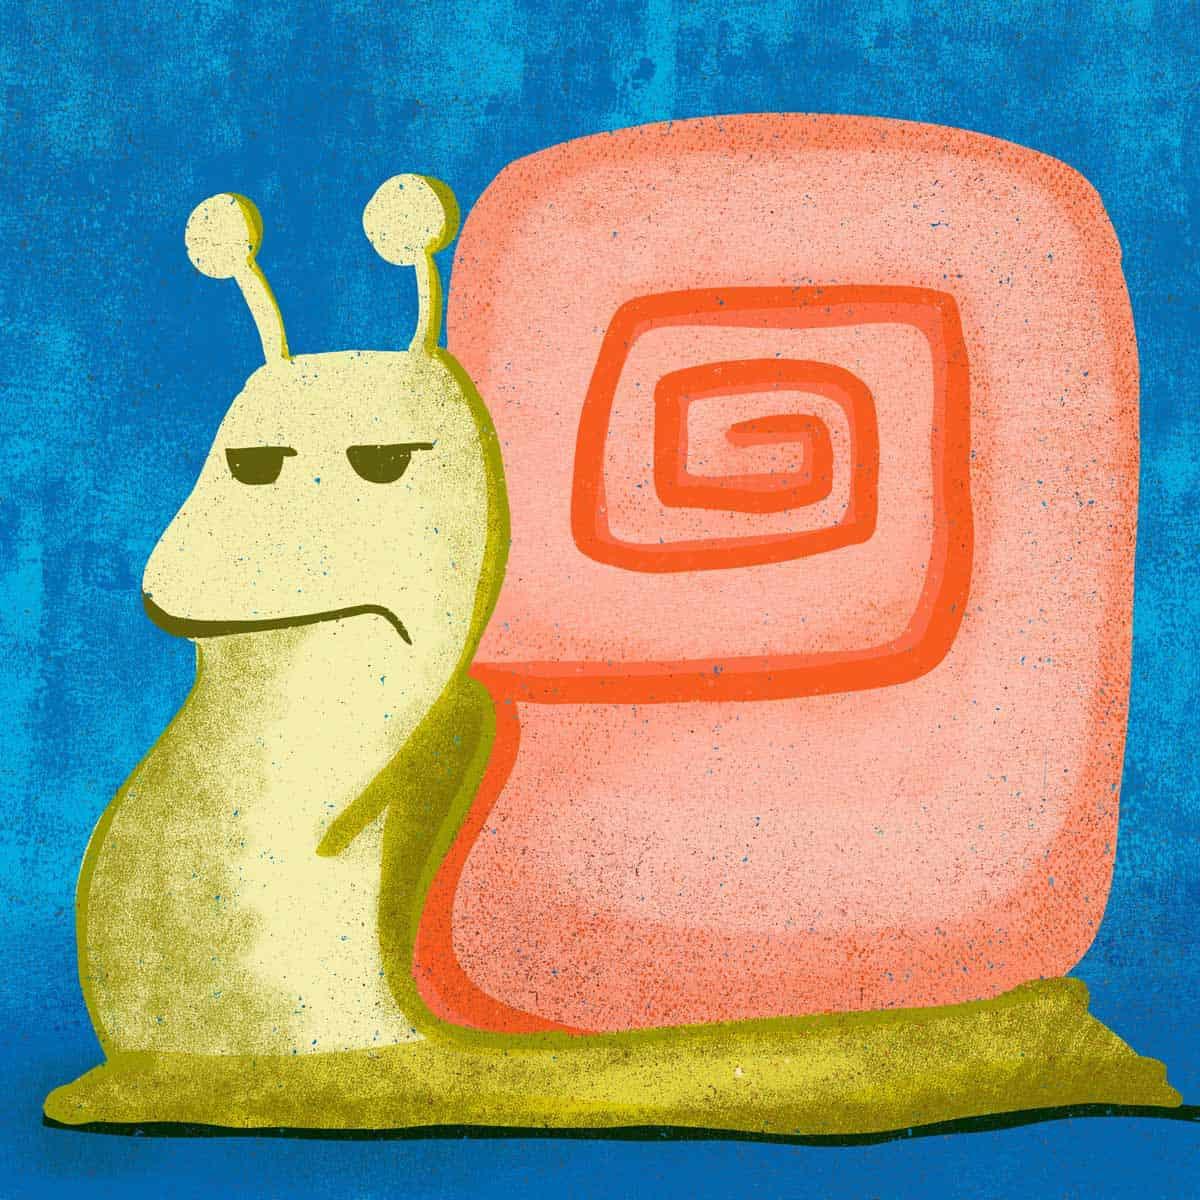 hilledesign-illustration-annoyed-animals-snail